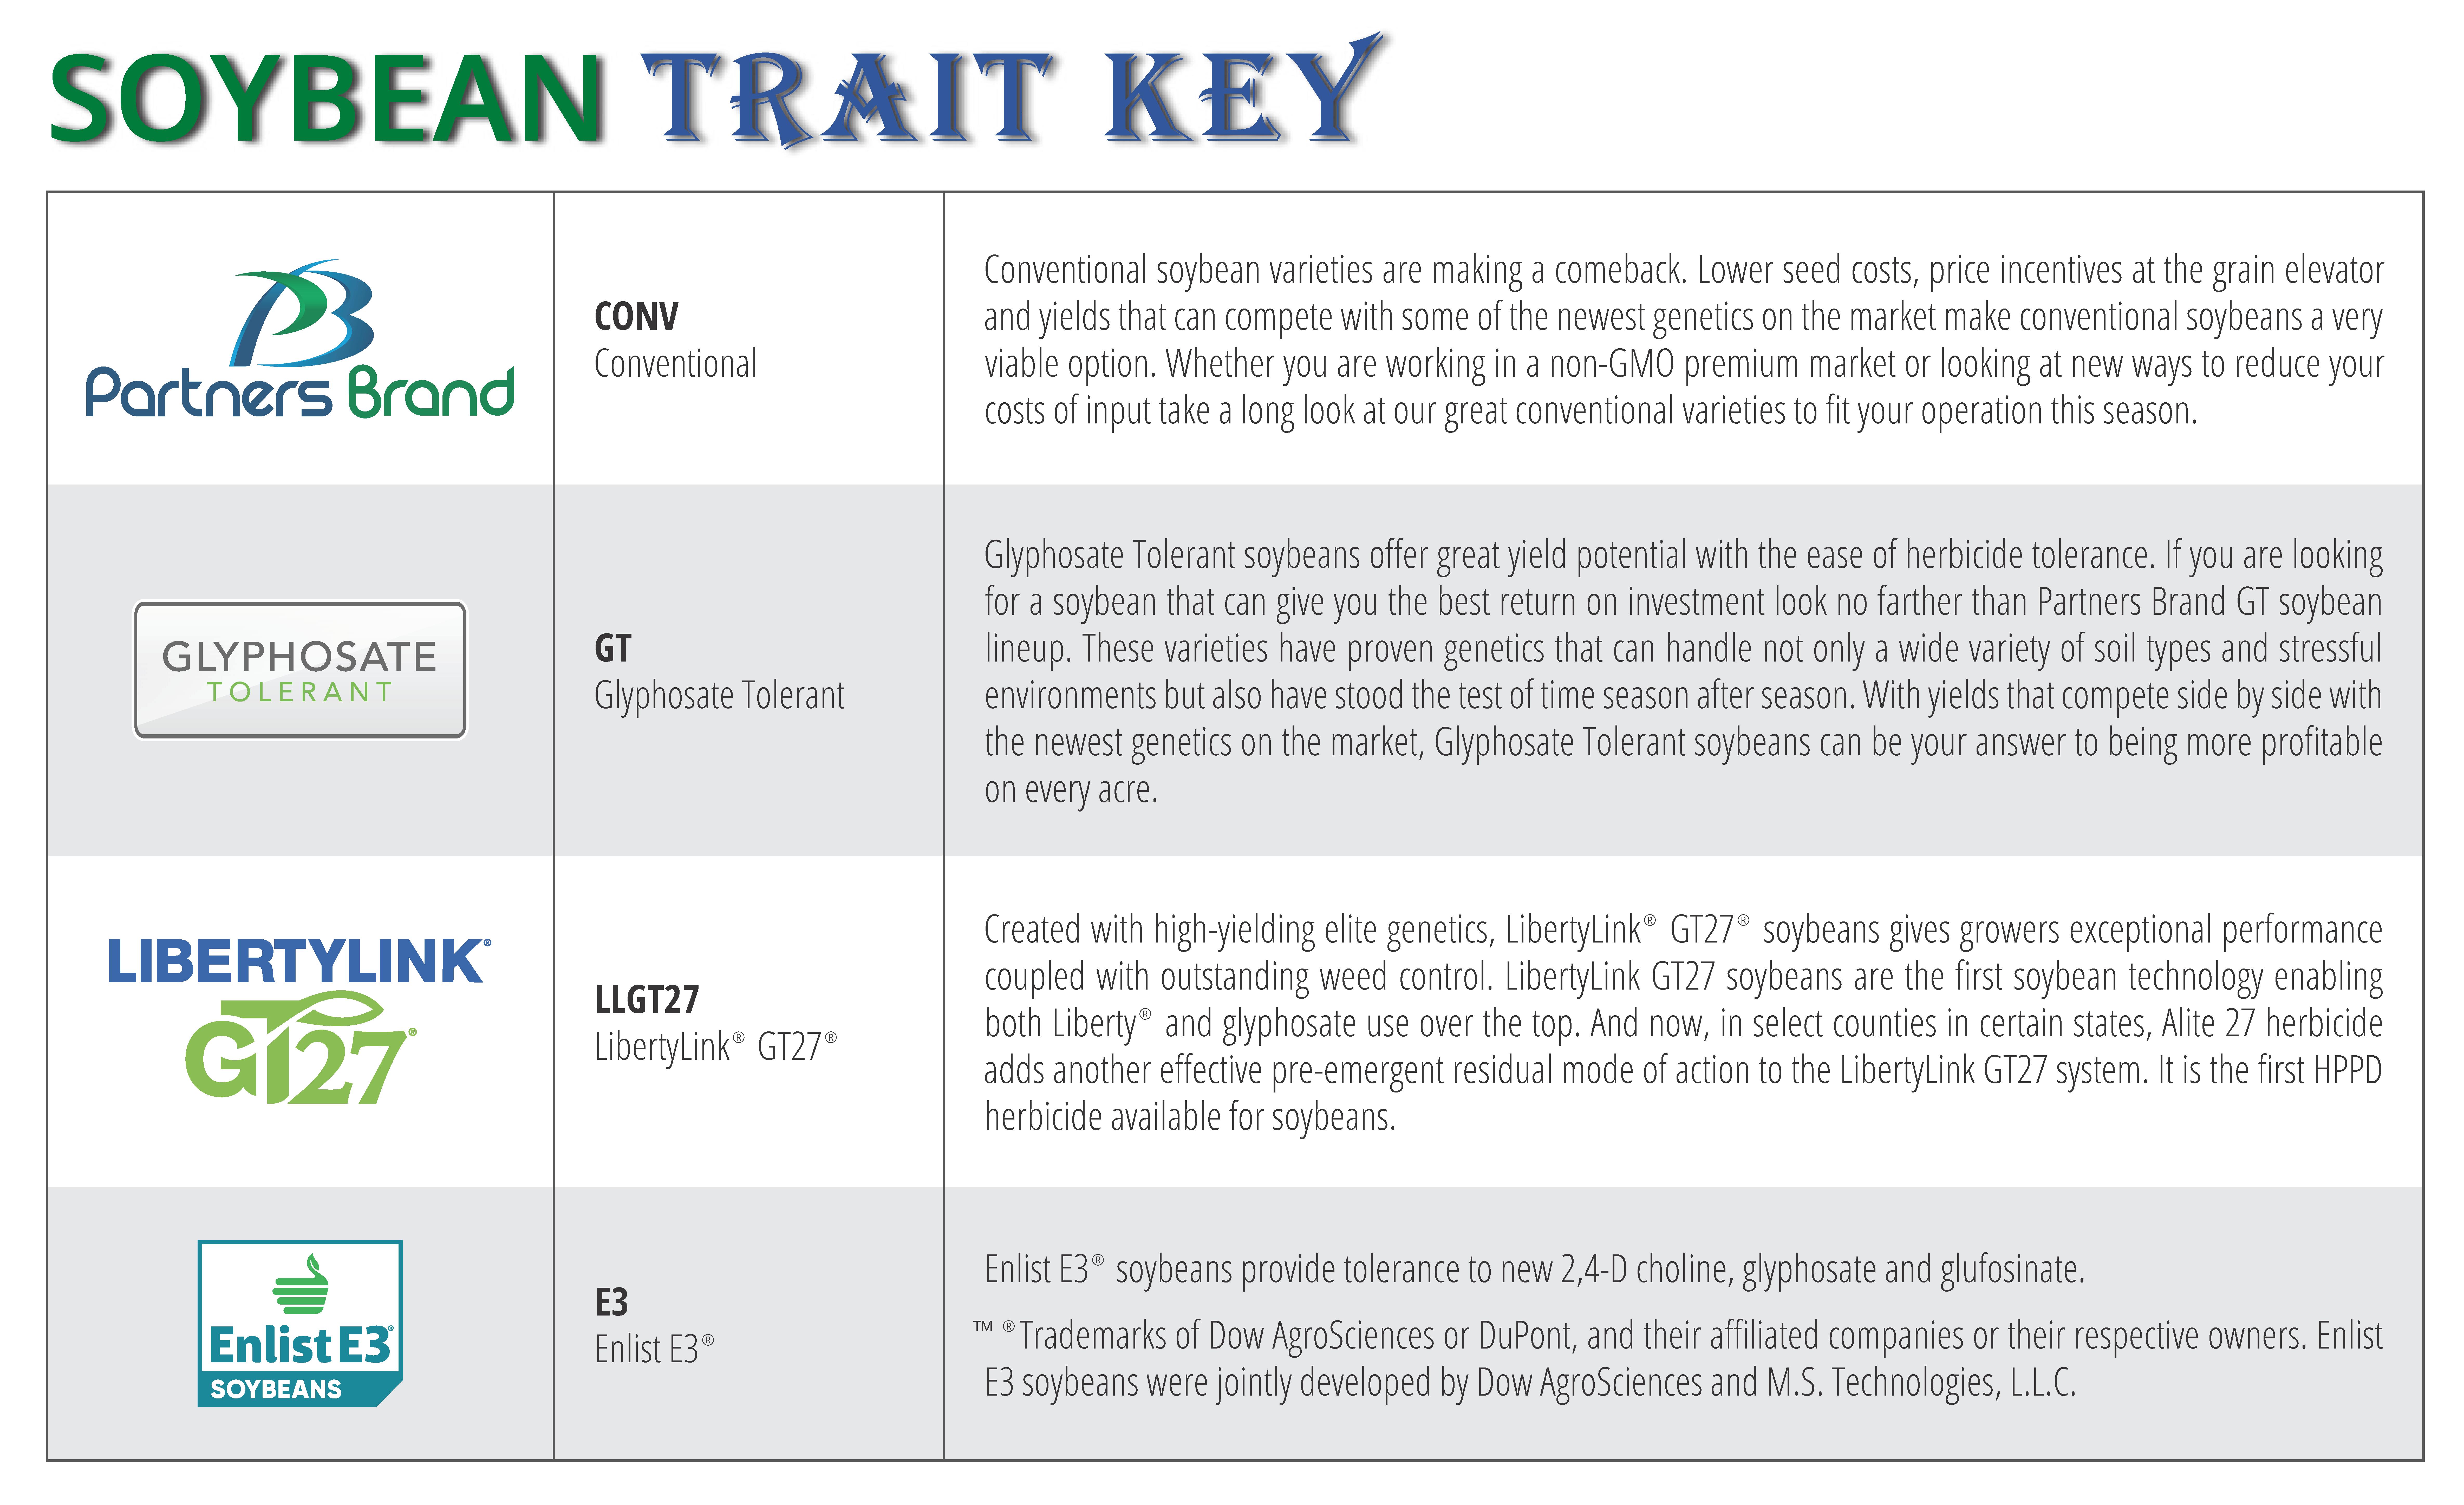 Soybean Trait Key